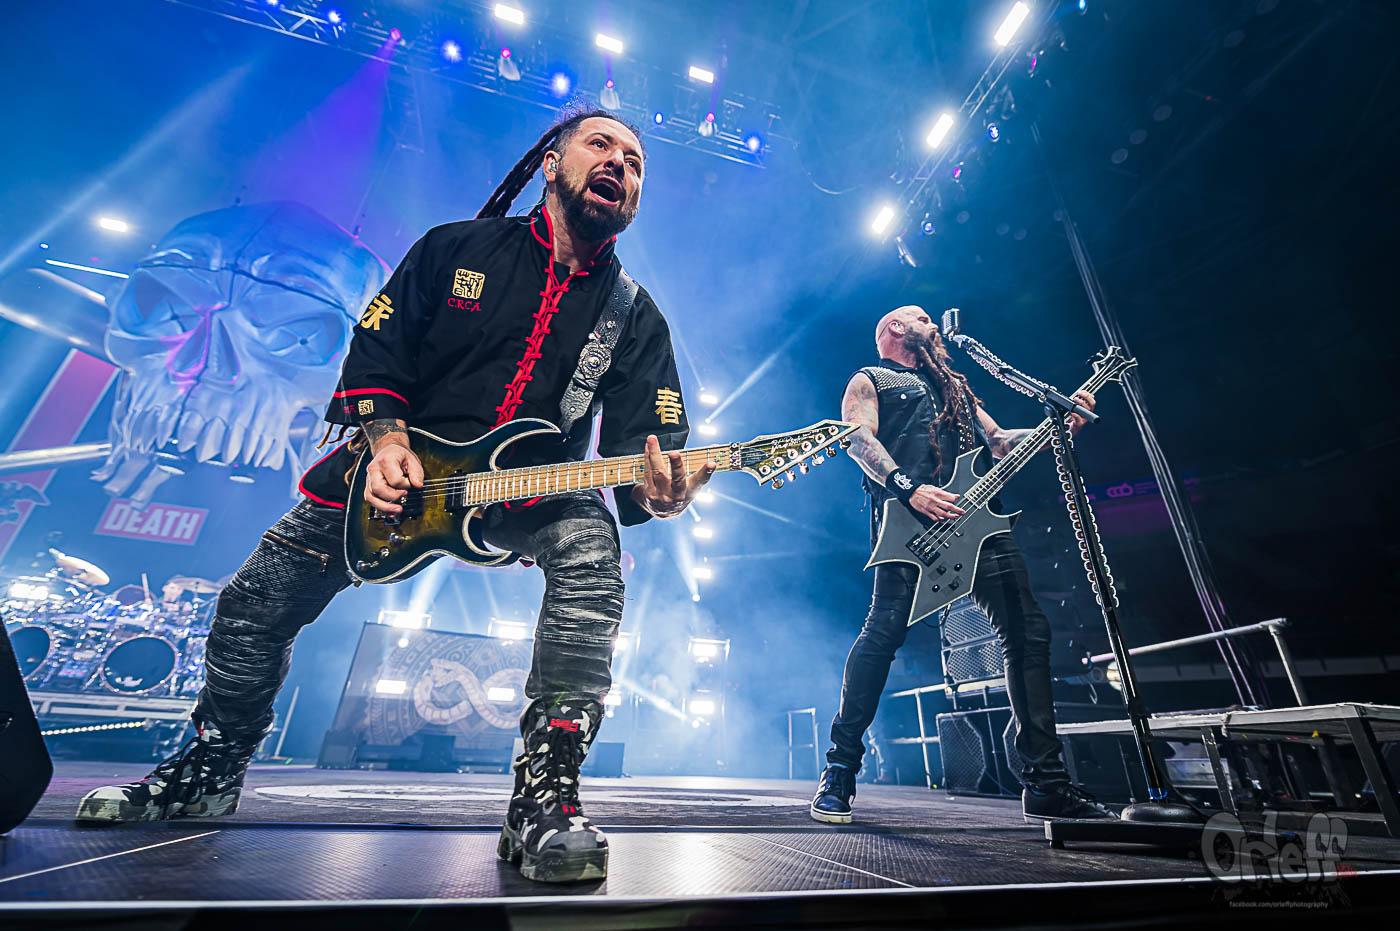 Five Finger Death Punch @ Arena Armeets, 2020